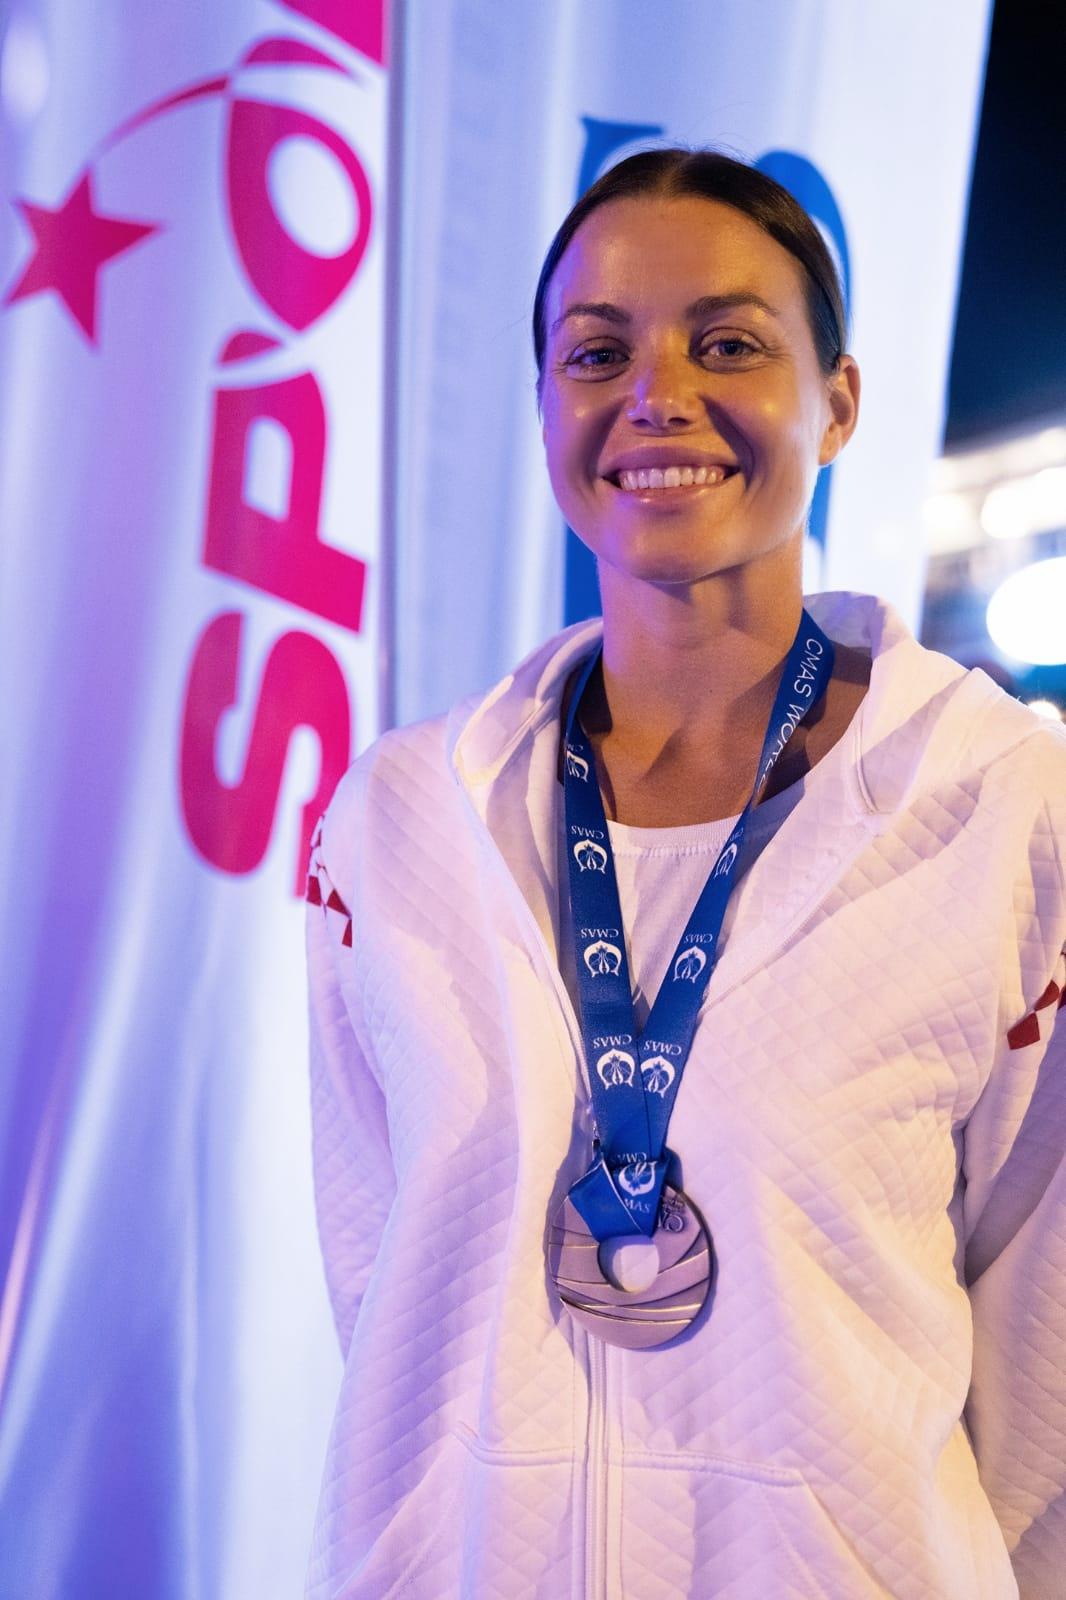 Croatian freediver Mirela Kardašević wins bronze medal at World Championships